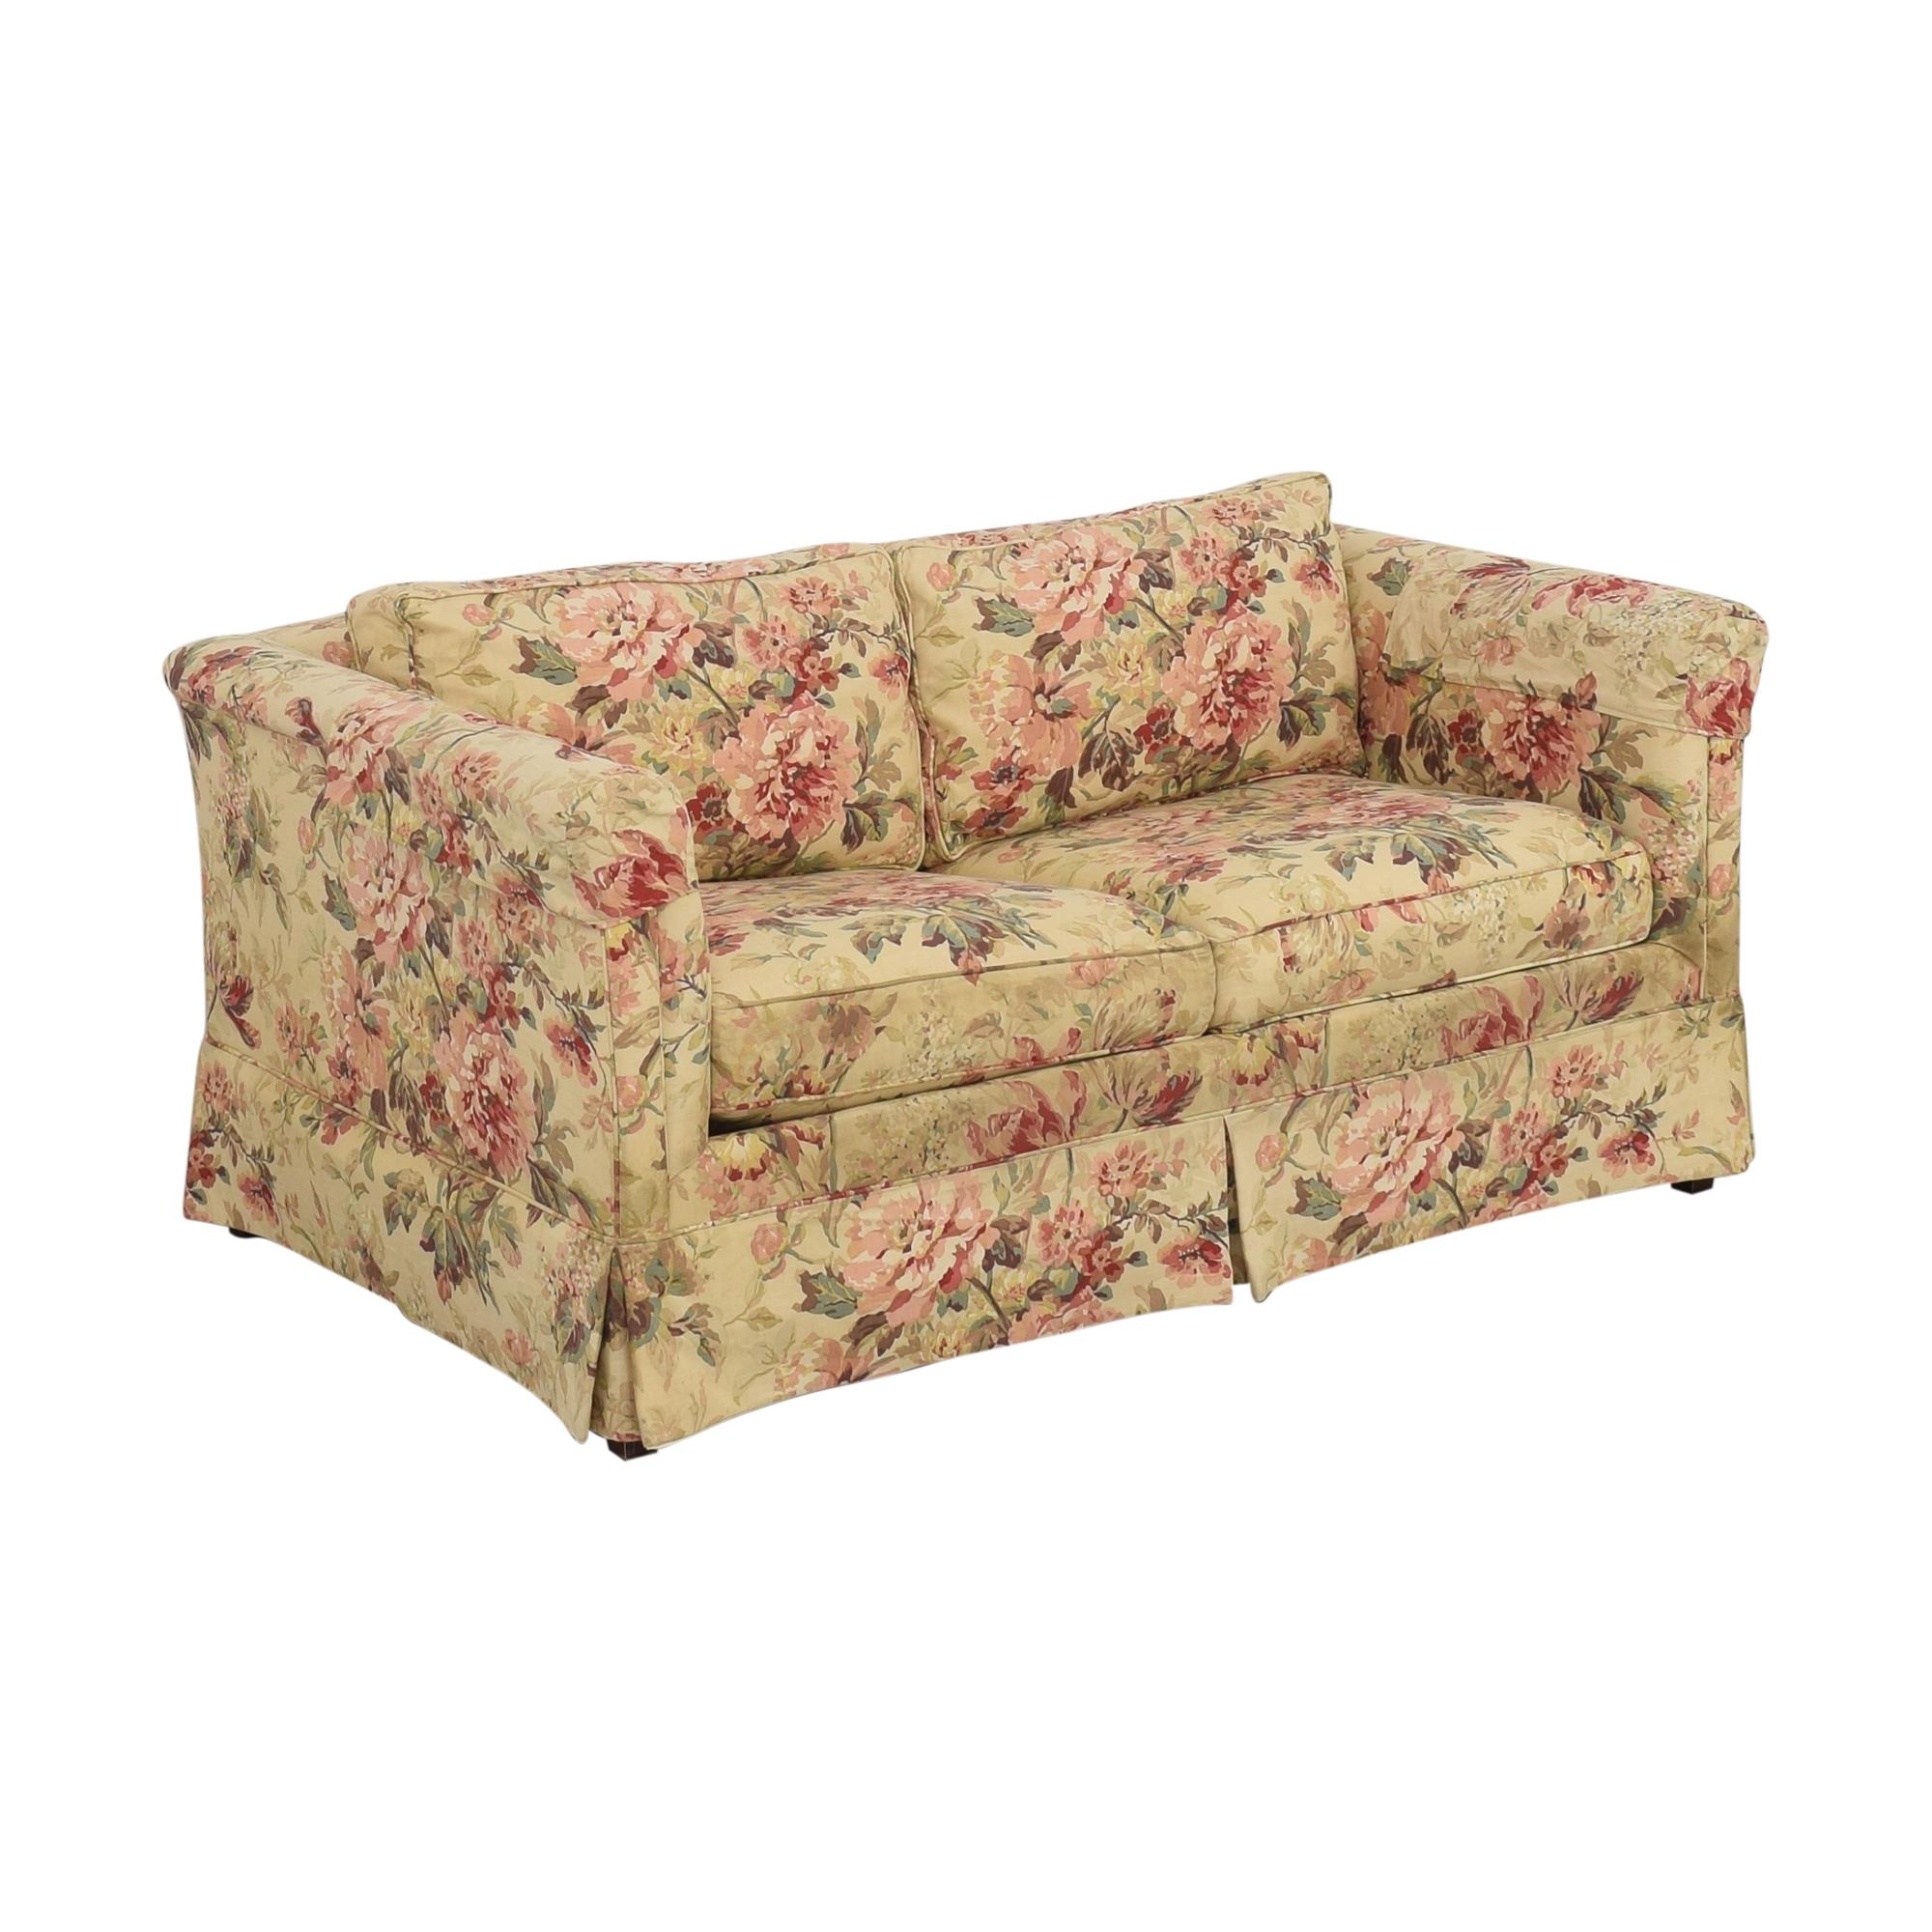 William Alan William Alan Loveseat Sleeper Sofa nj